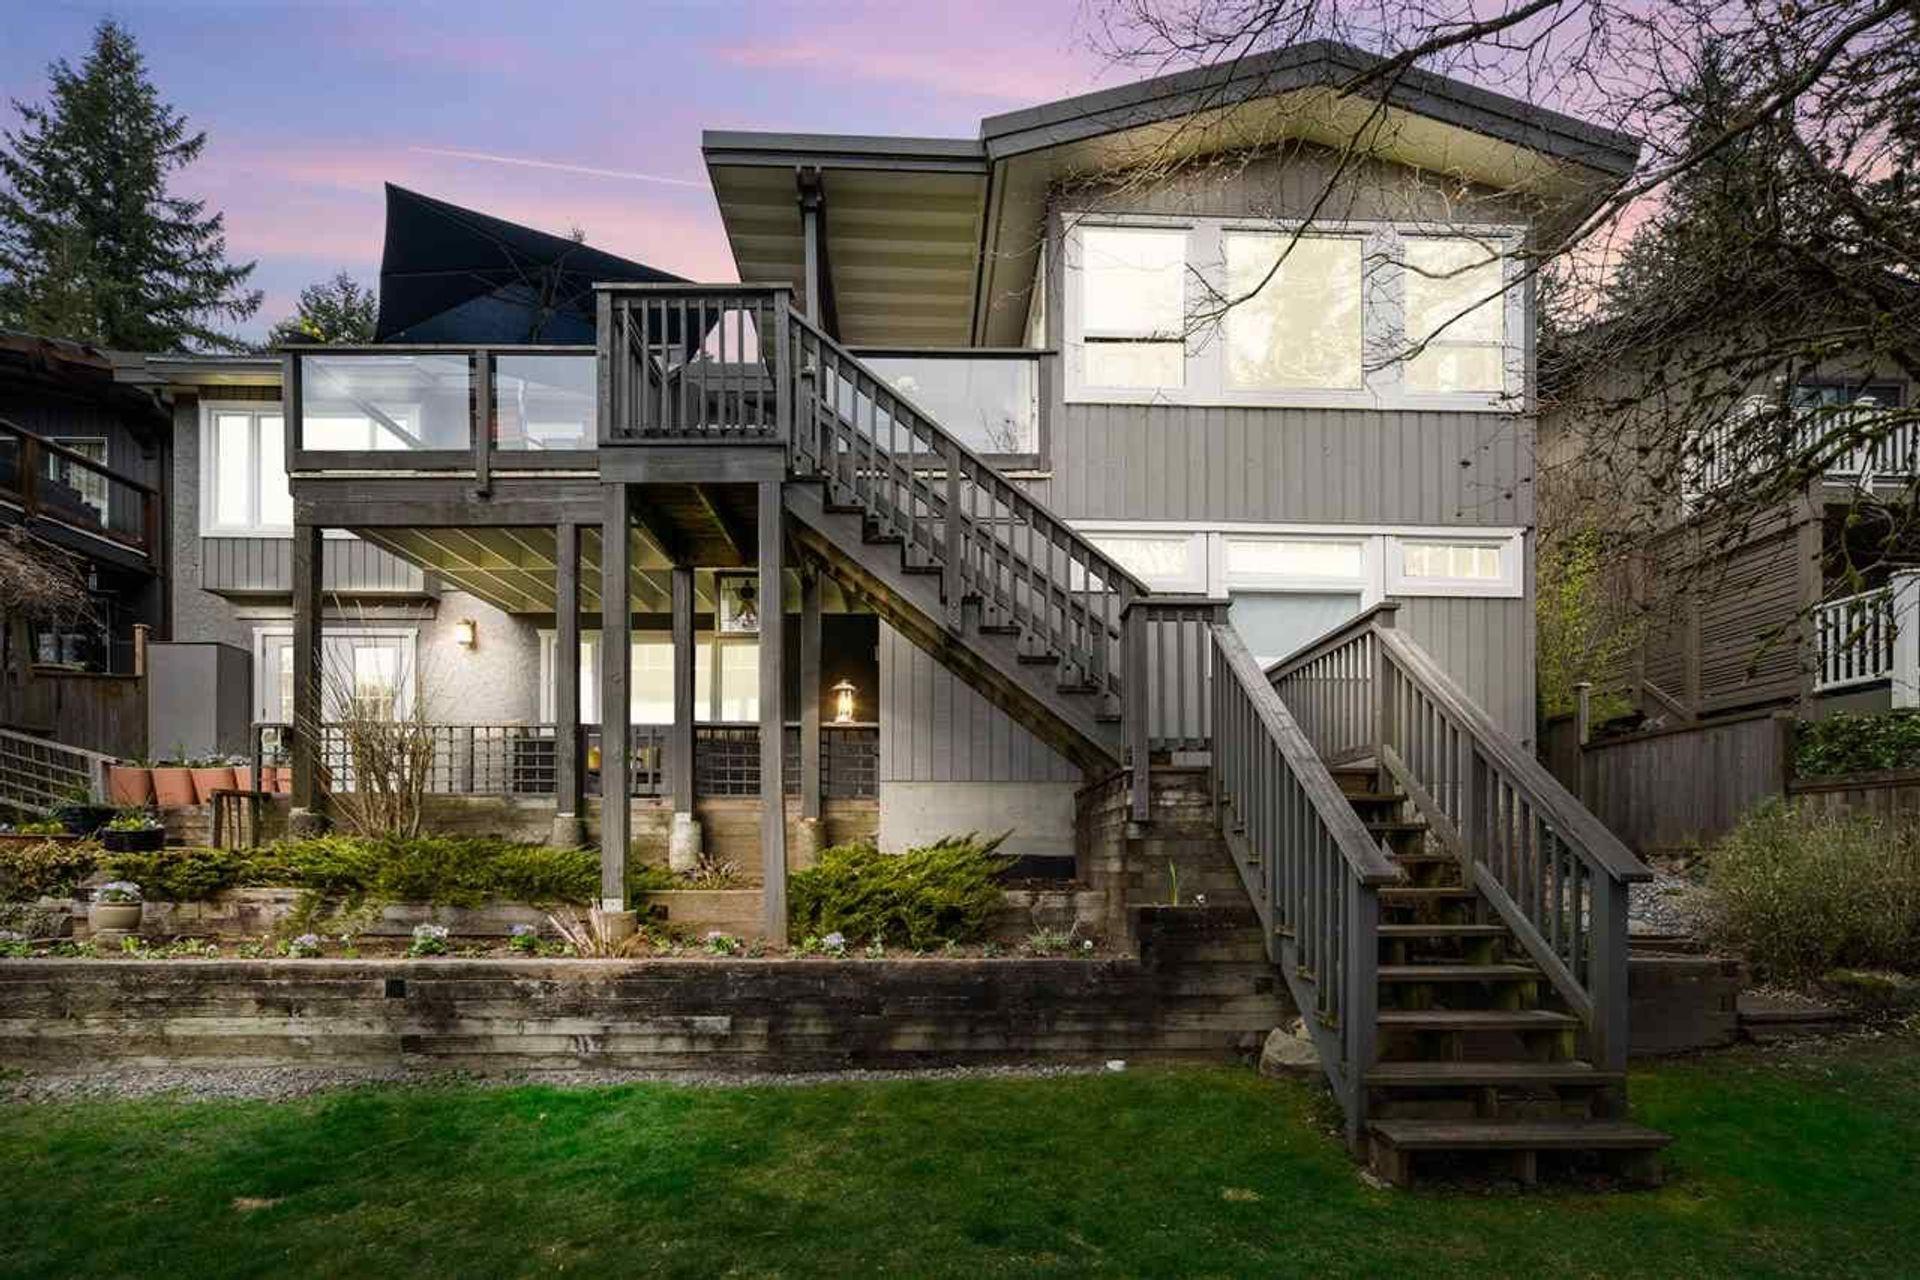 1939-hyannis-drive-blueridge-nv-north-vancouver-01 at 1939 Hyannis Drive, Blueridge NV, North Vancouver